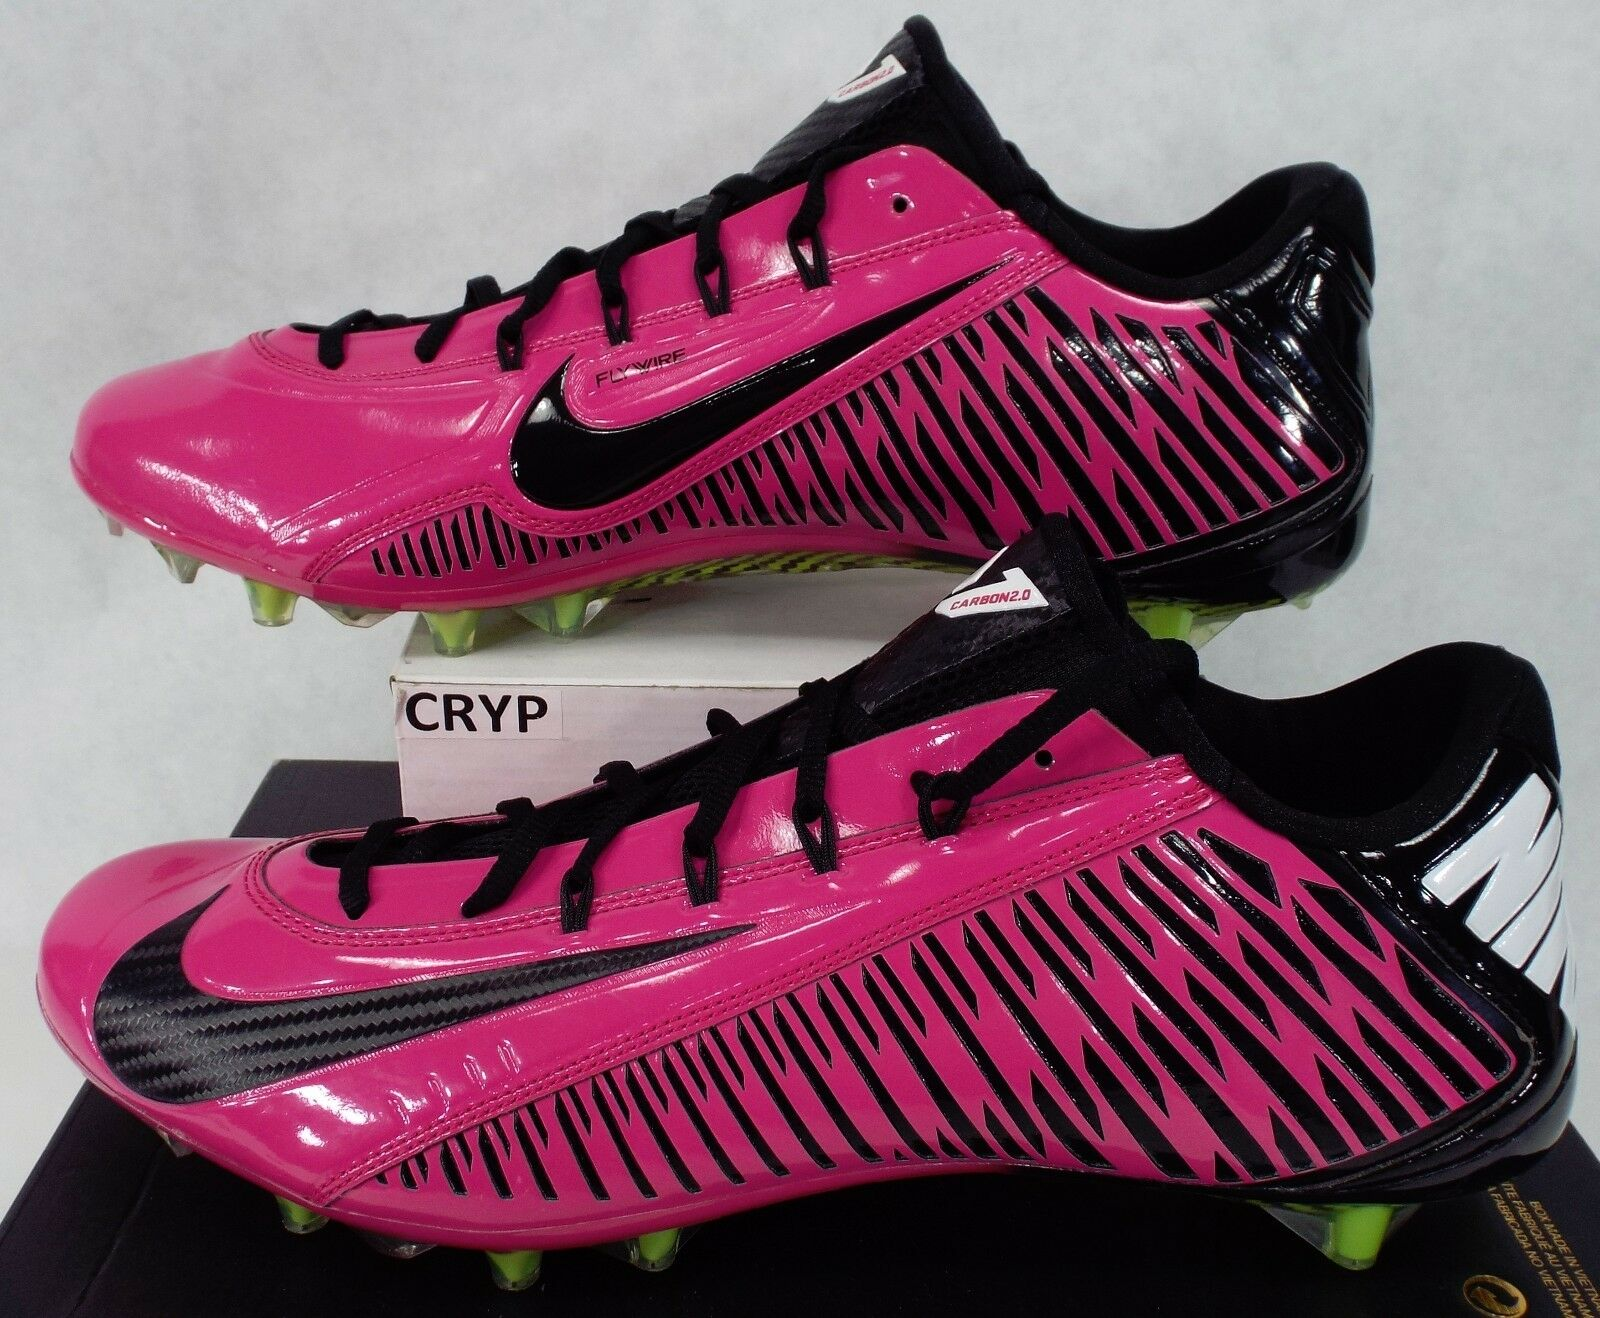 New Mens 14.5 NIKE Vapor Carbon Elite TD Pink Cancer Cleats Shoes$160 695504-610